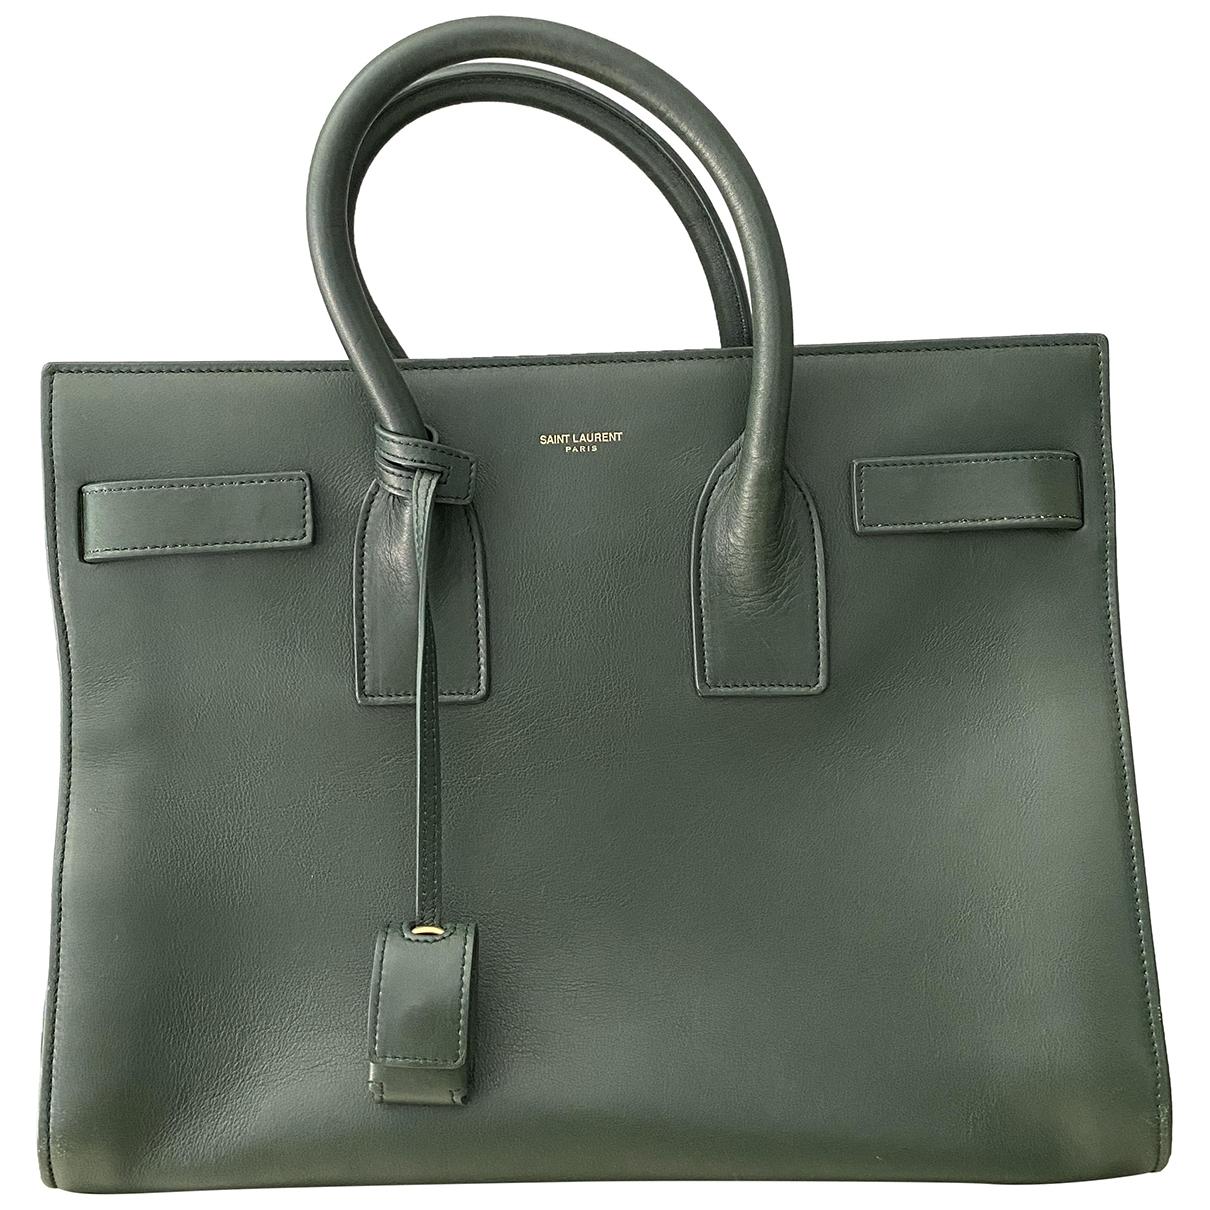 Saint Laurent Sac de Jour Green Leather handbag for Women \N